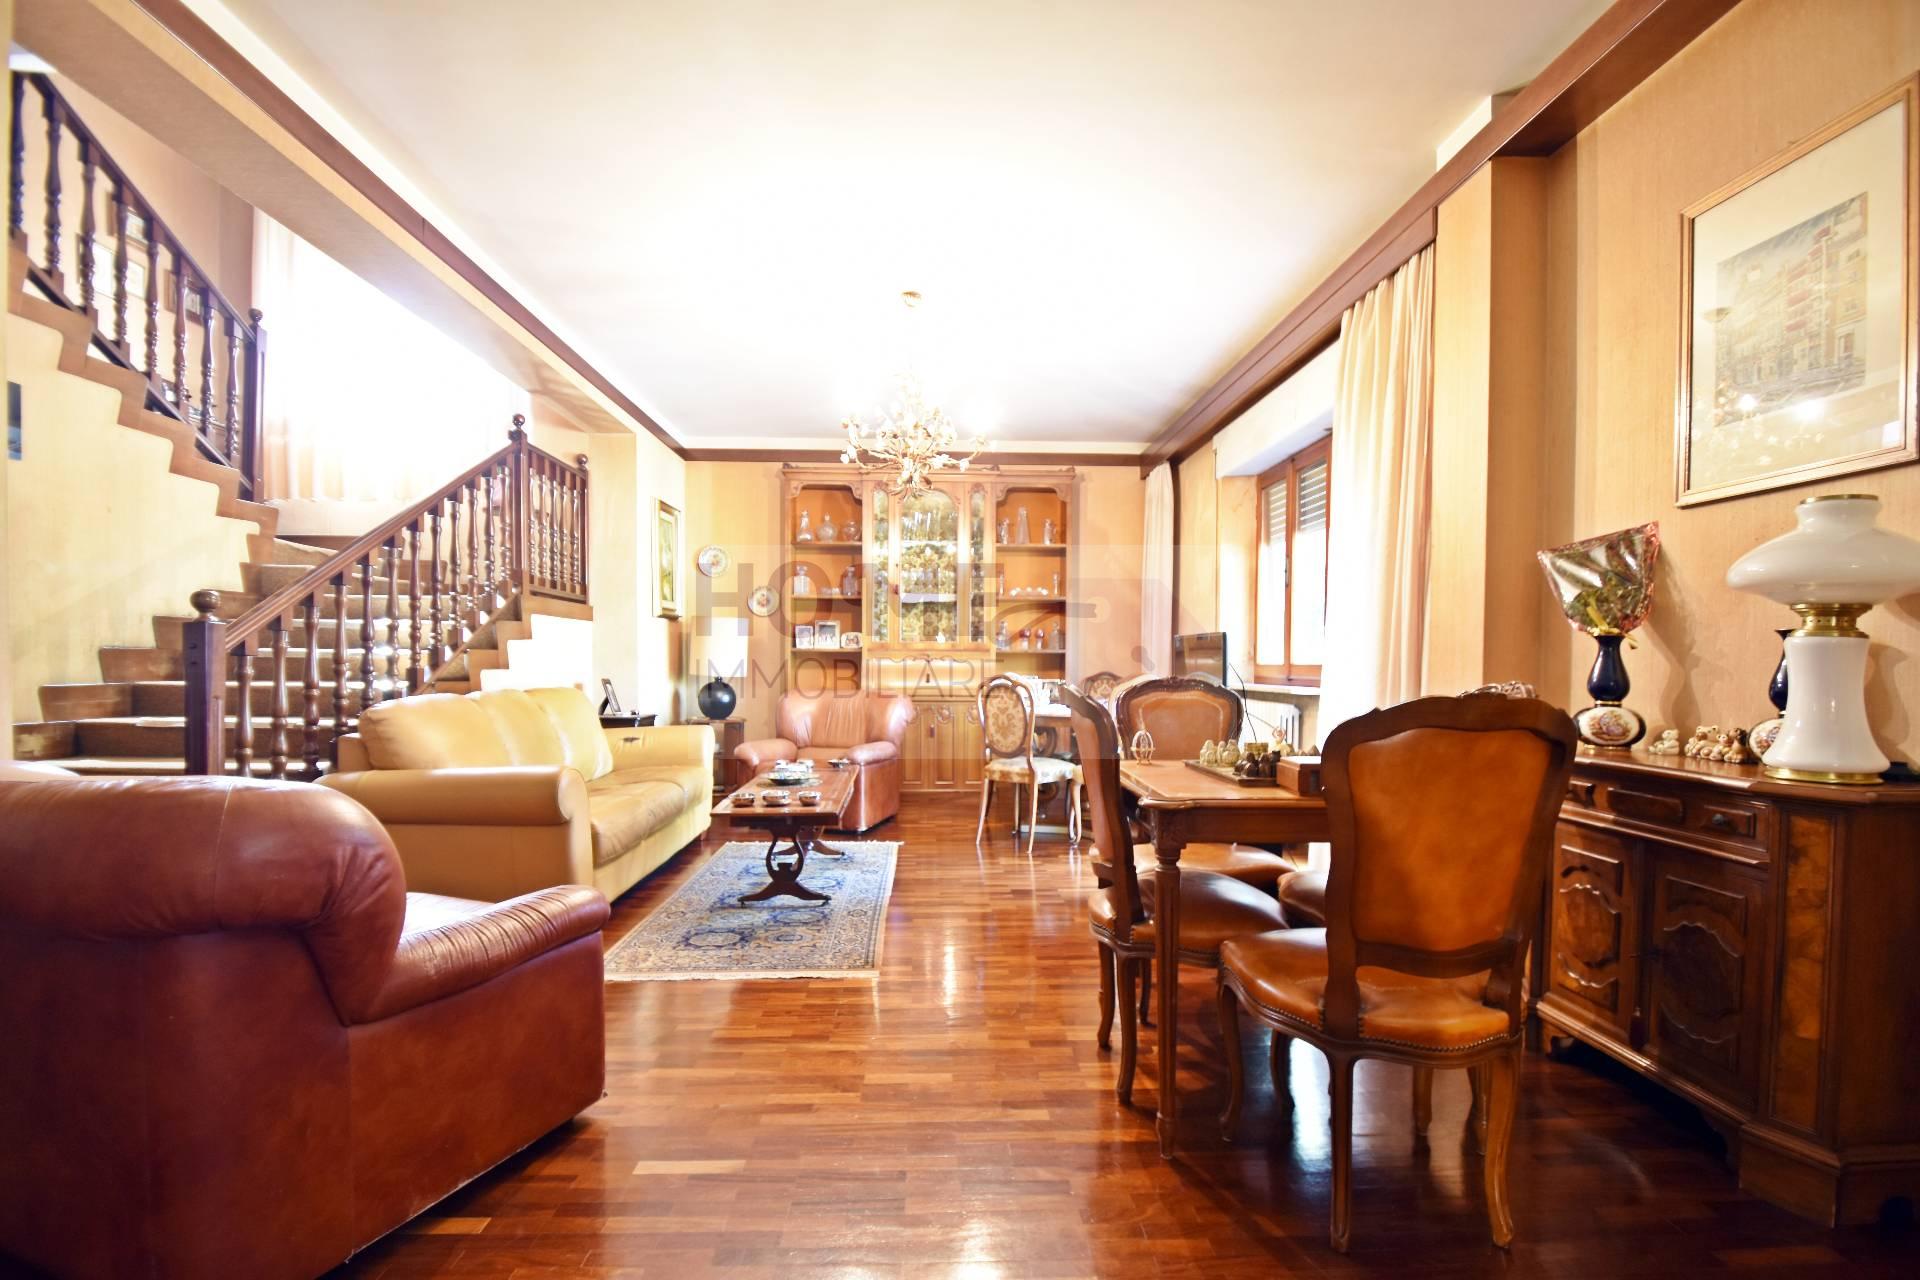 macerata vendita quart: zona tribunale home immobiliare srl